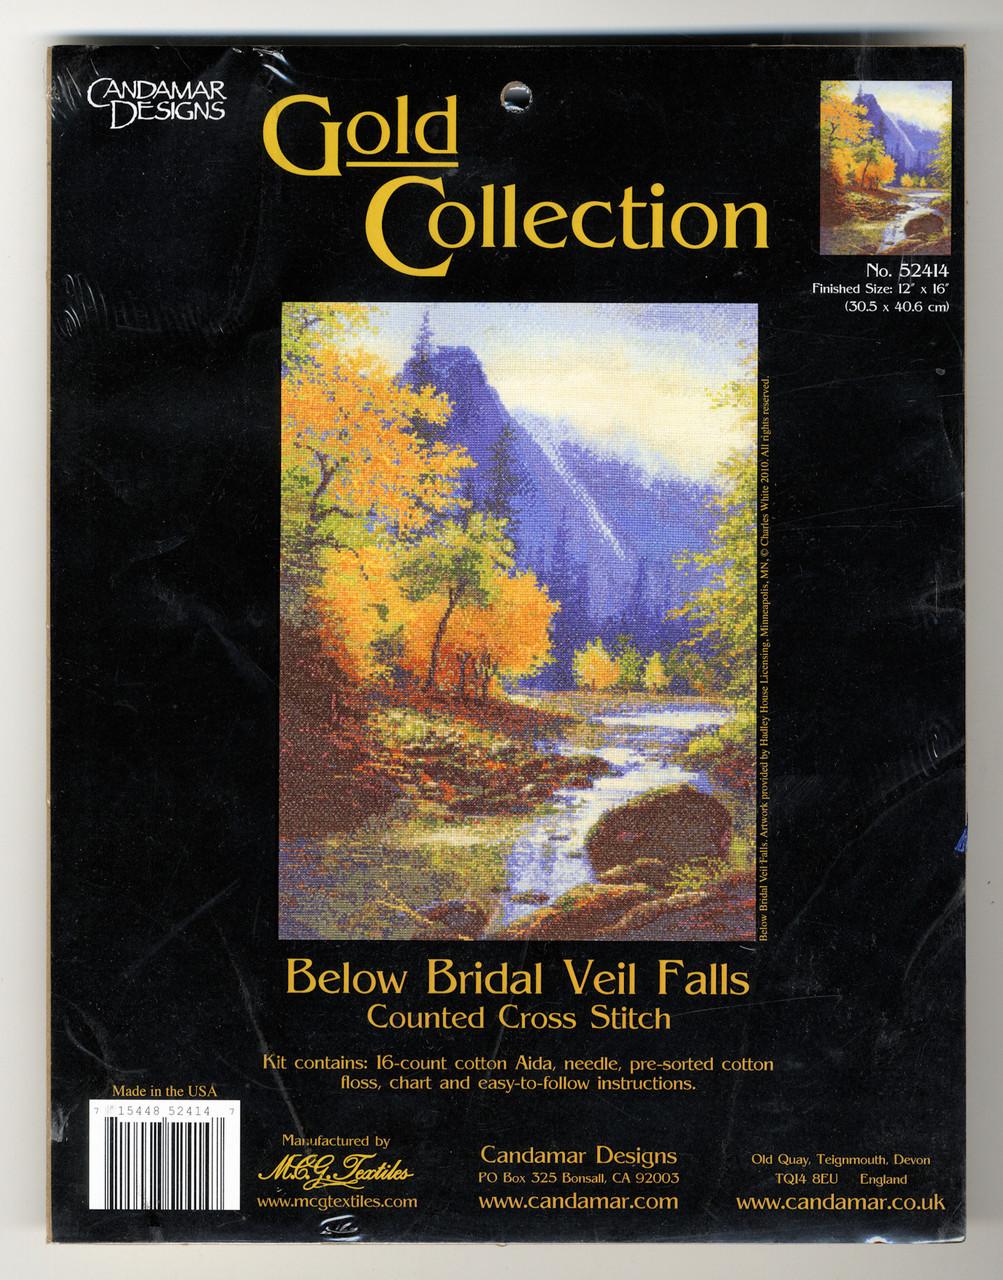 Gold Collection - Below Bridal Veil Falls